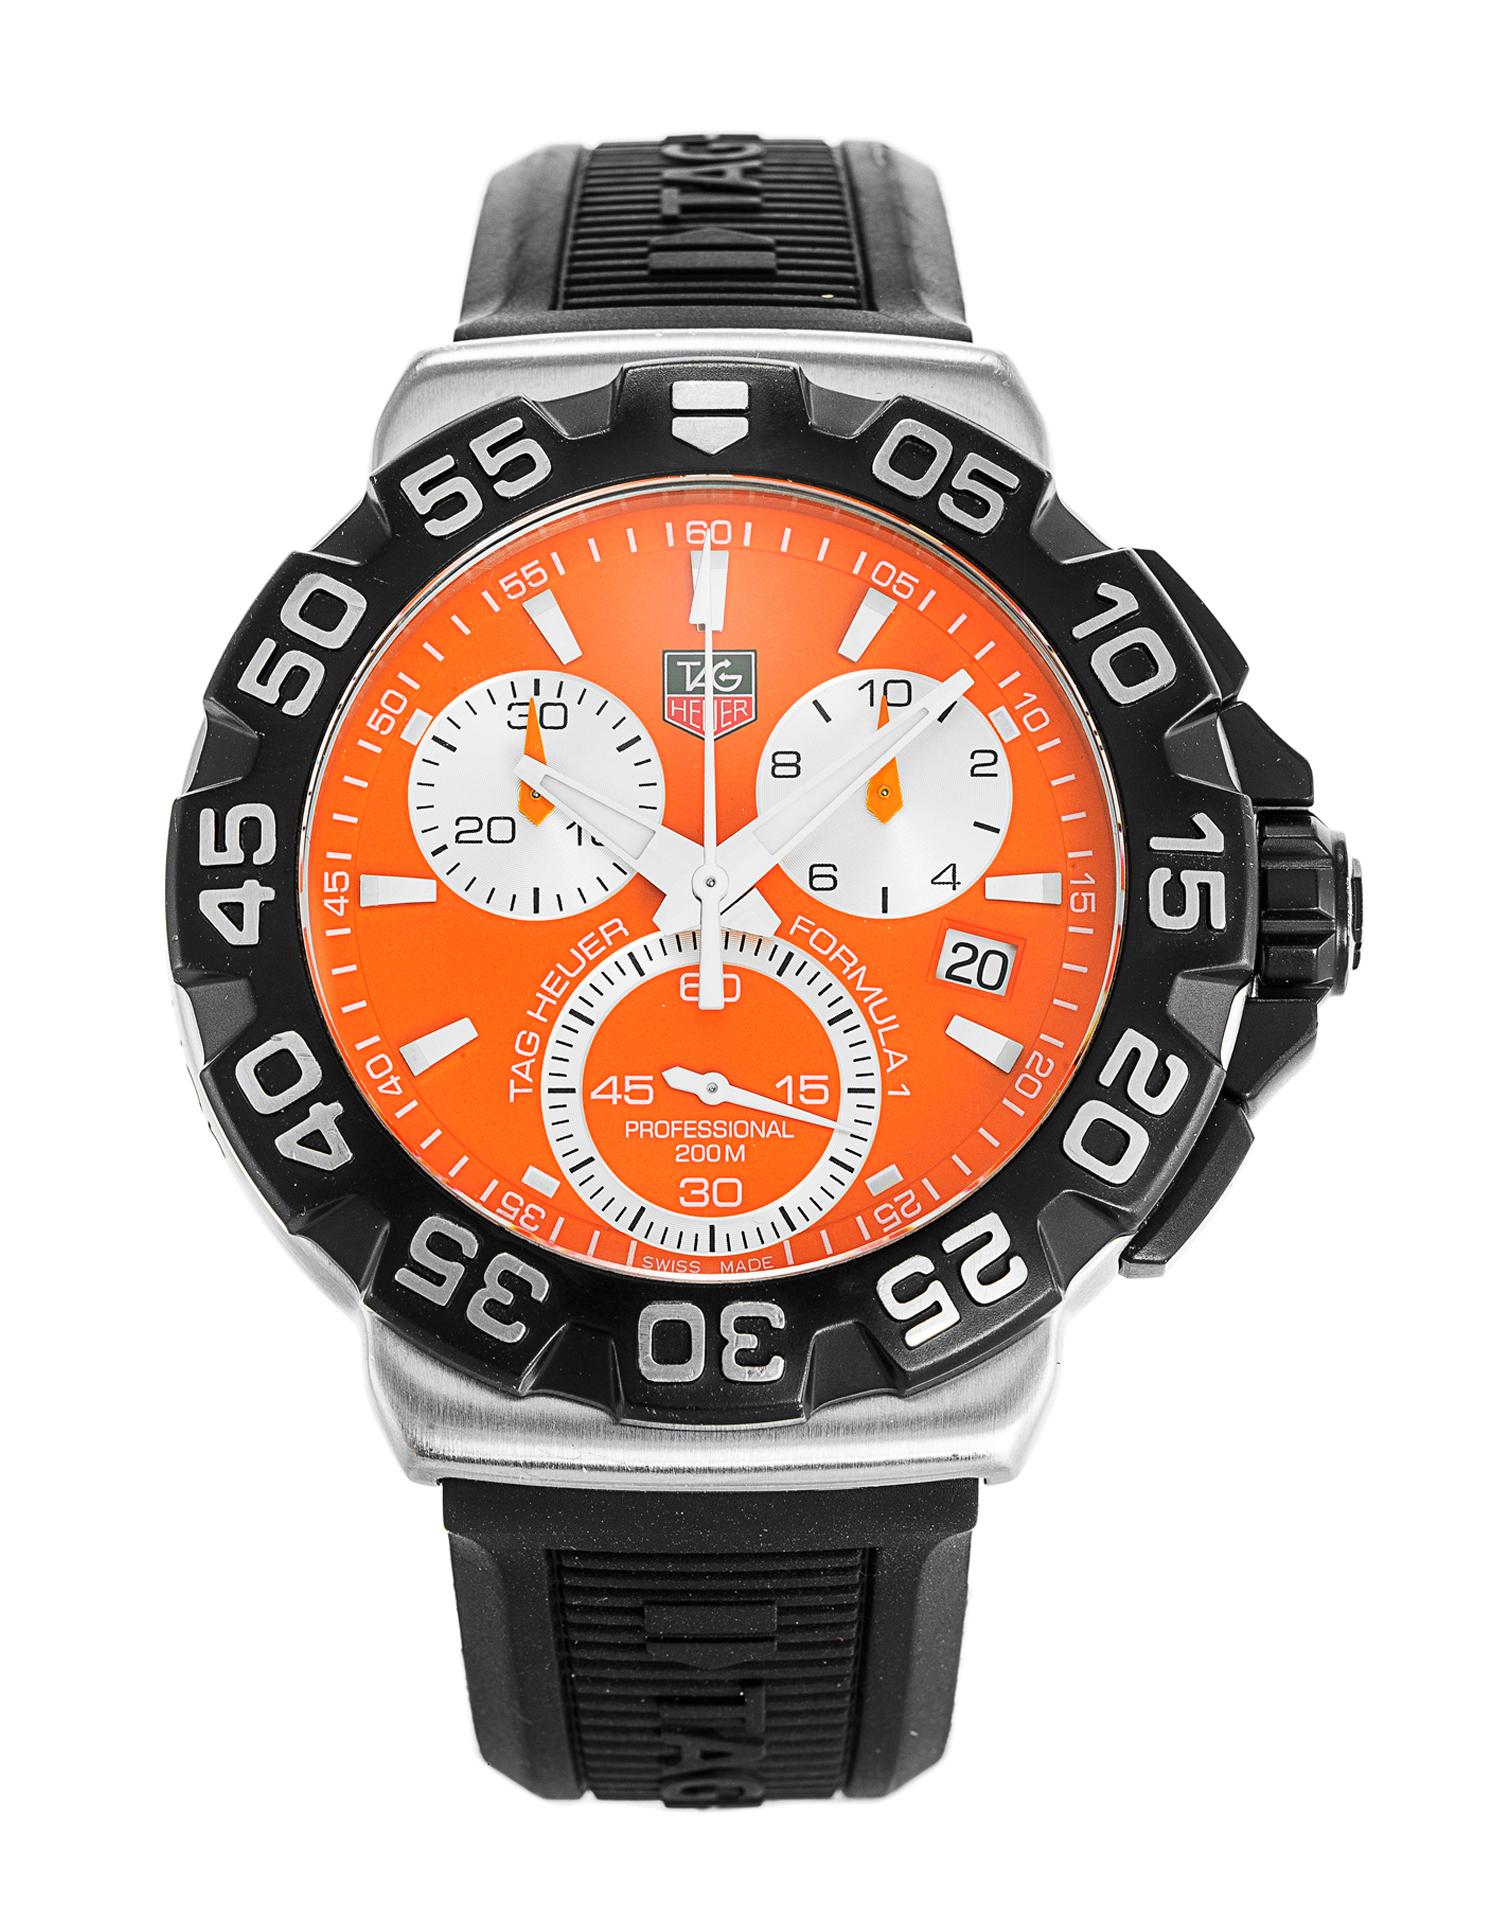 63a64cca340 Tag Heuer Men s CAH1113.BT0714 Formula 1 Chronograph Black Rubber ...